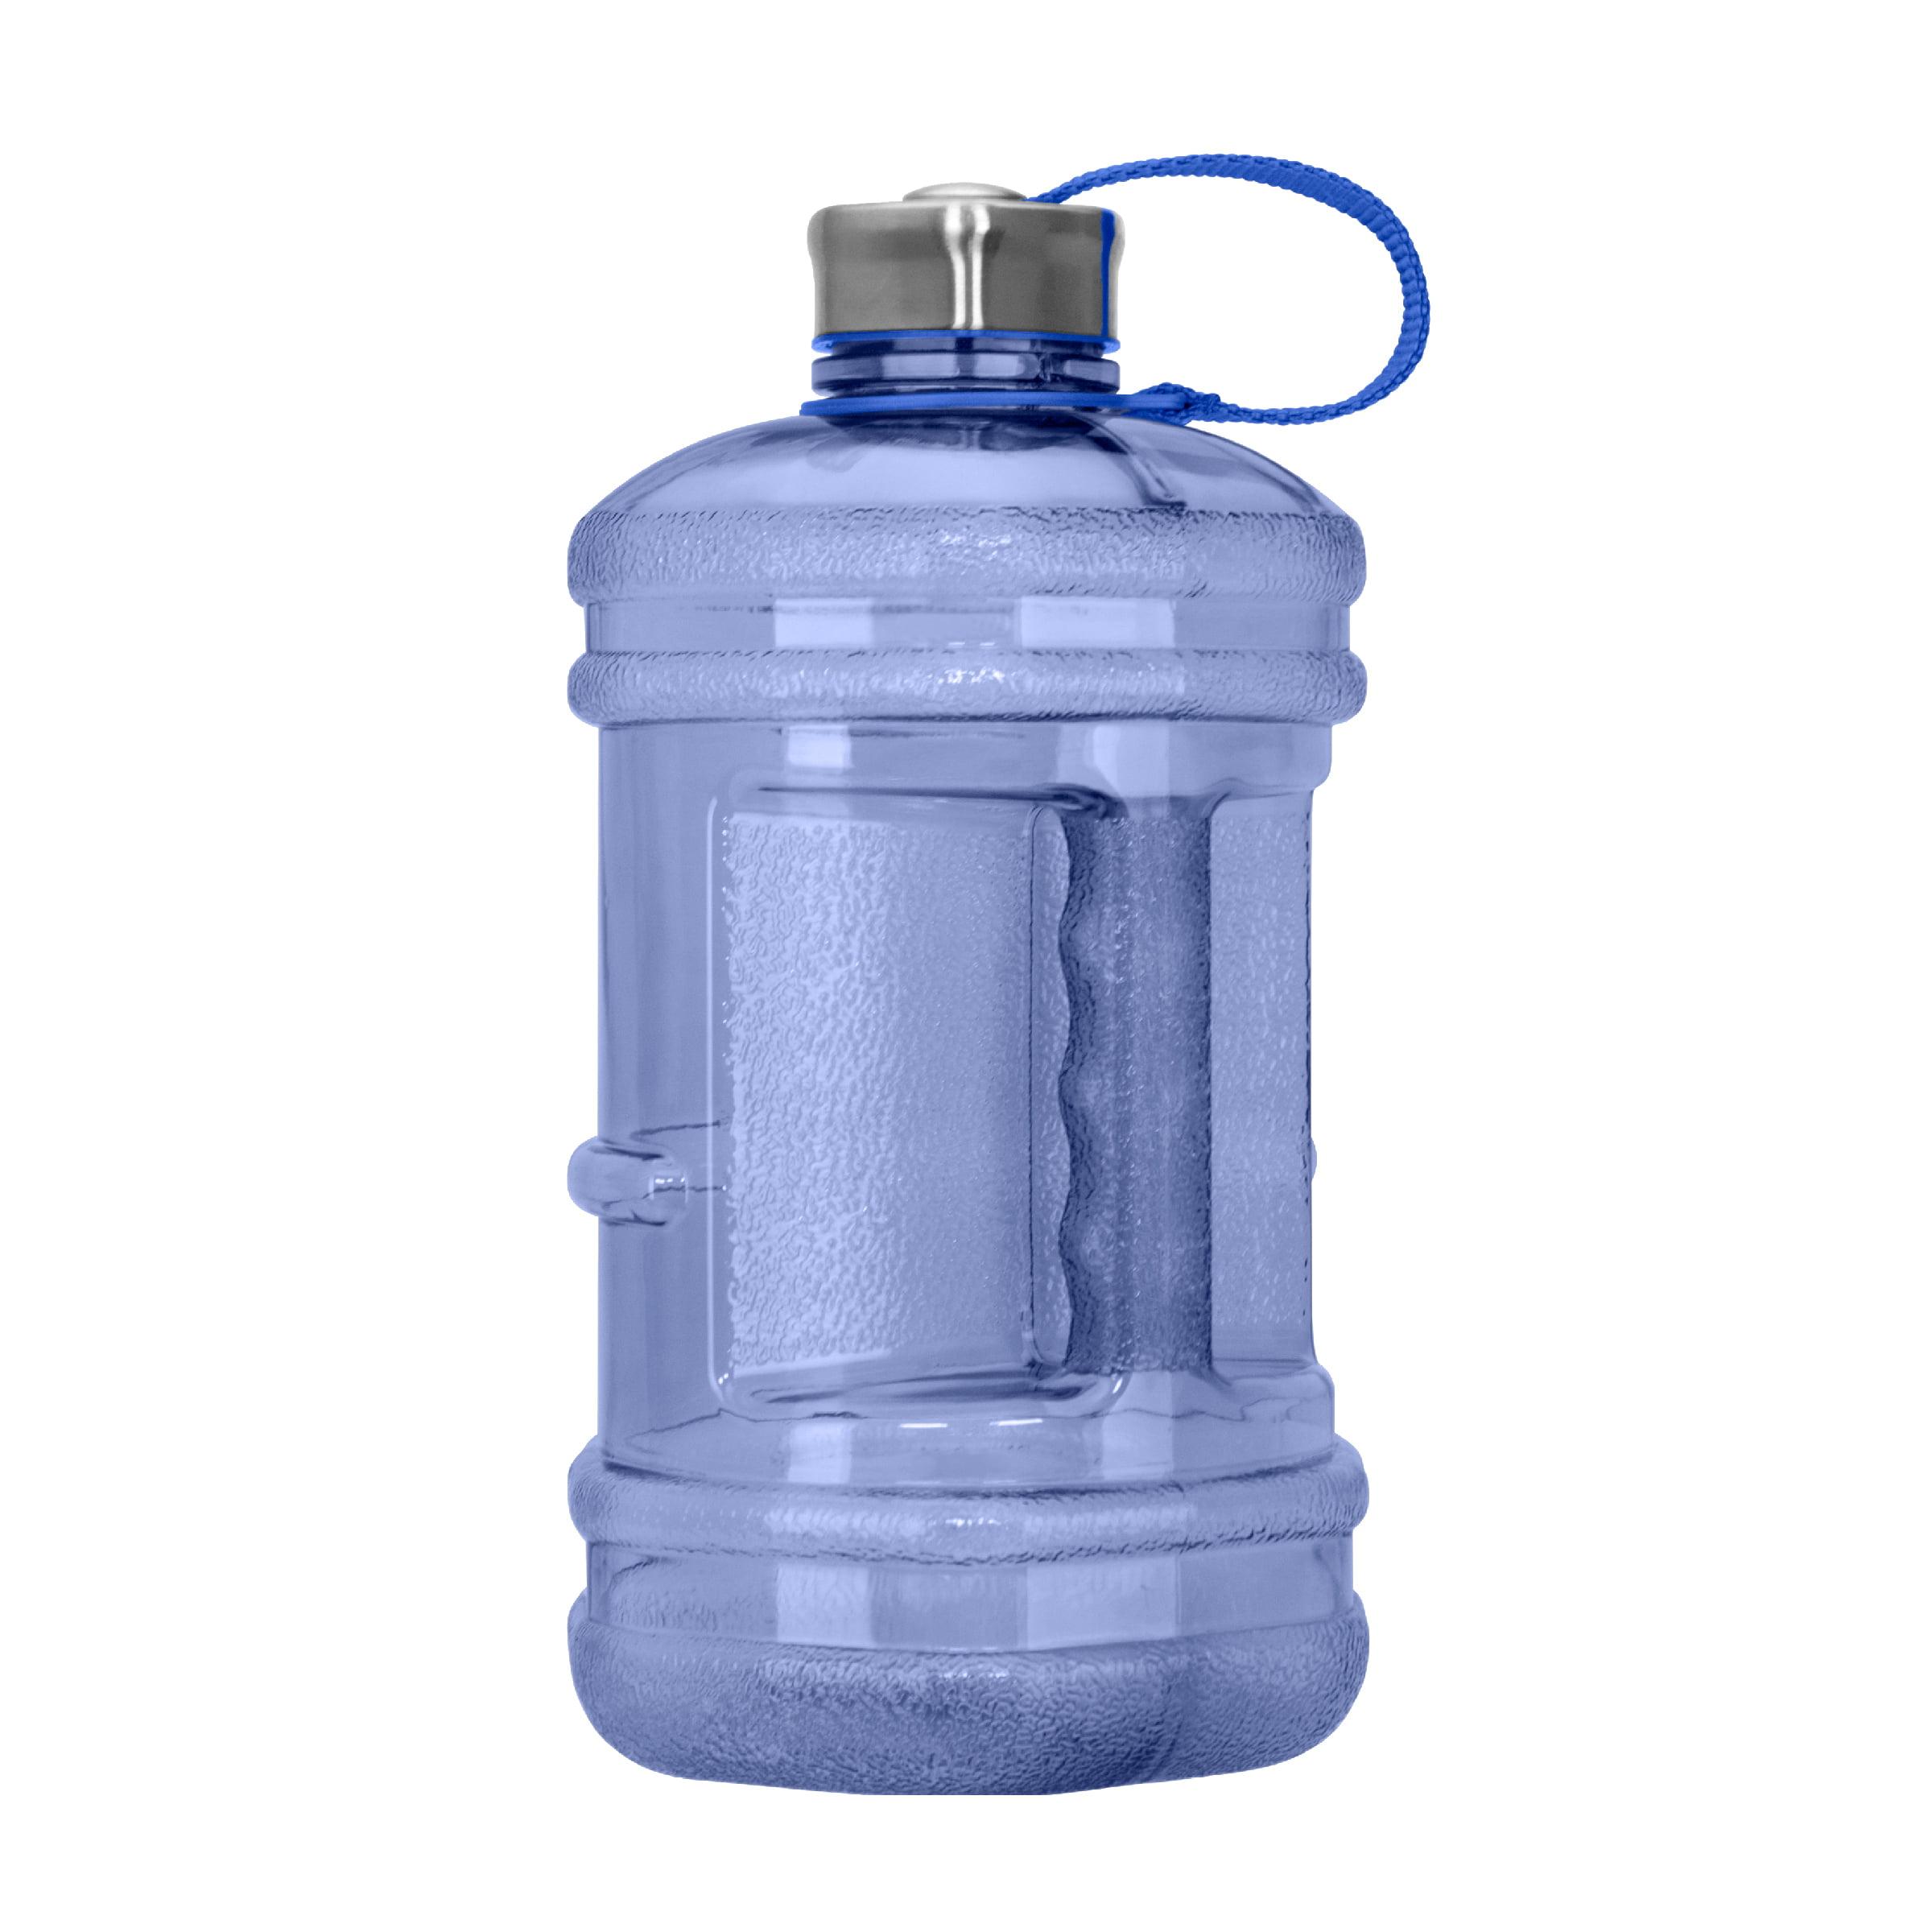 2.3 Liter (77 oz) BPA Free Hexagon Water Bottle w/48mm Steel Cap (Dark Blue)